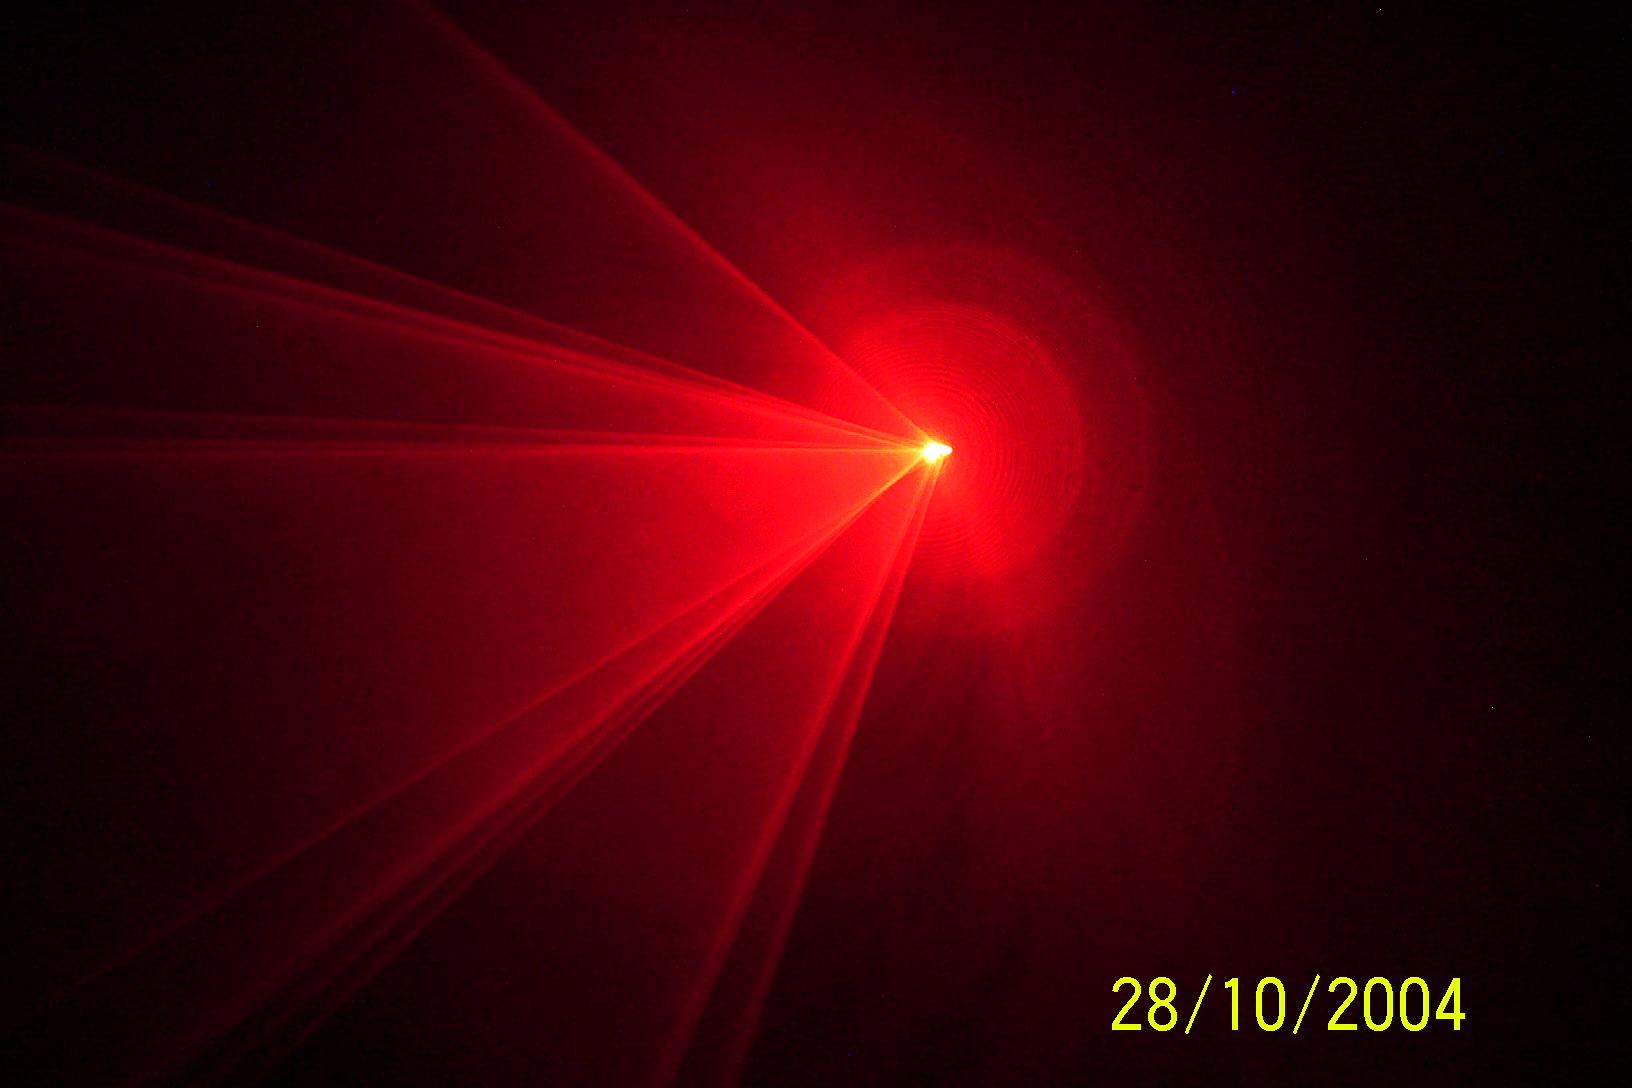 Image 14 of 21  -  194 kB